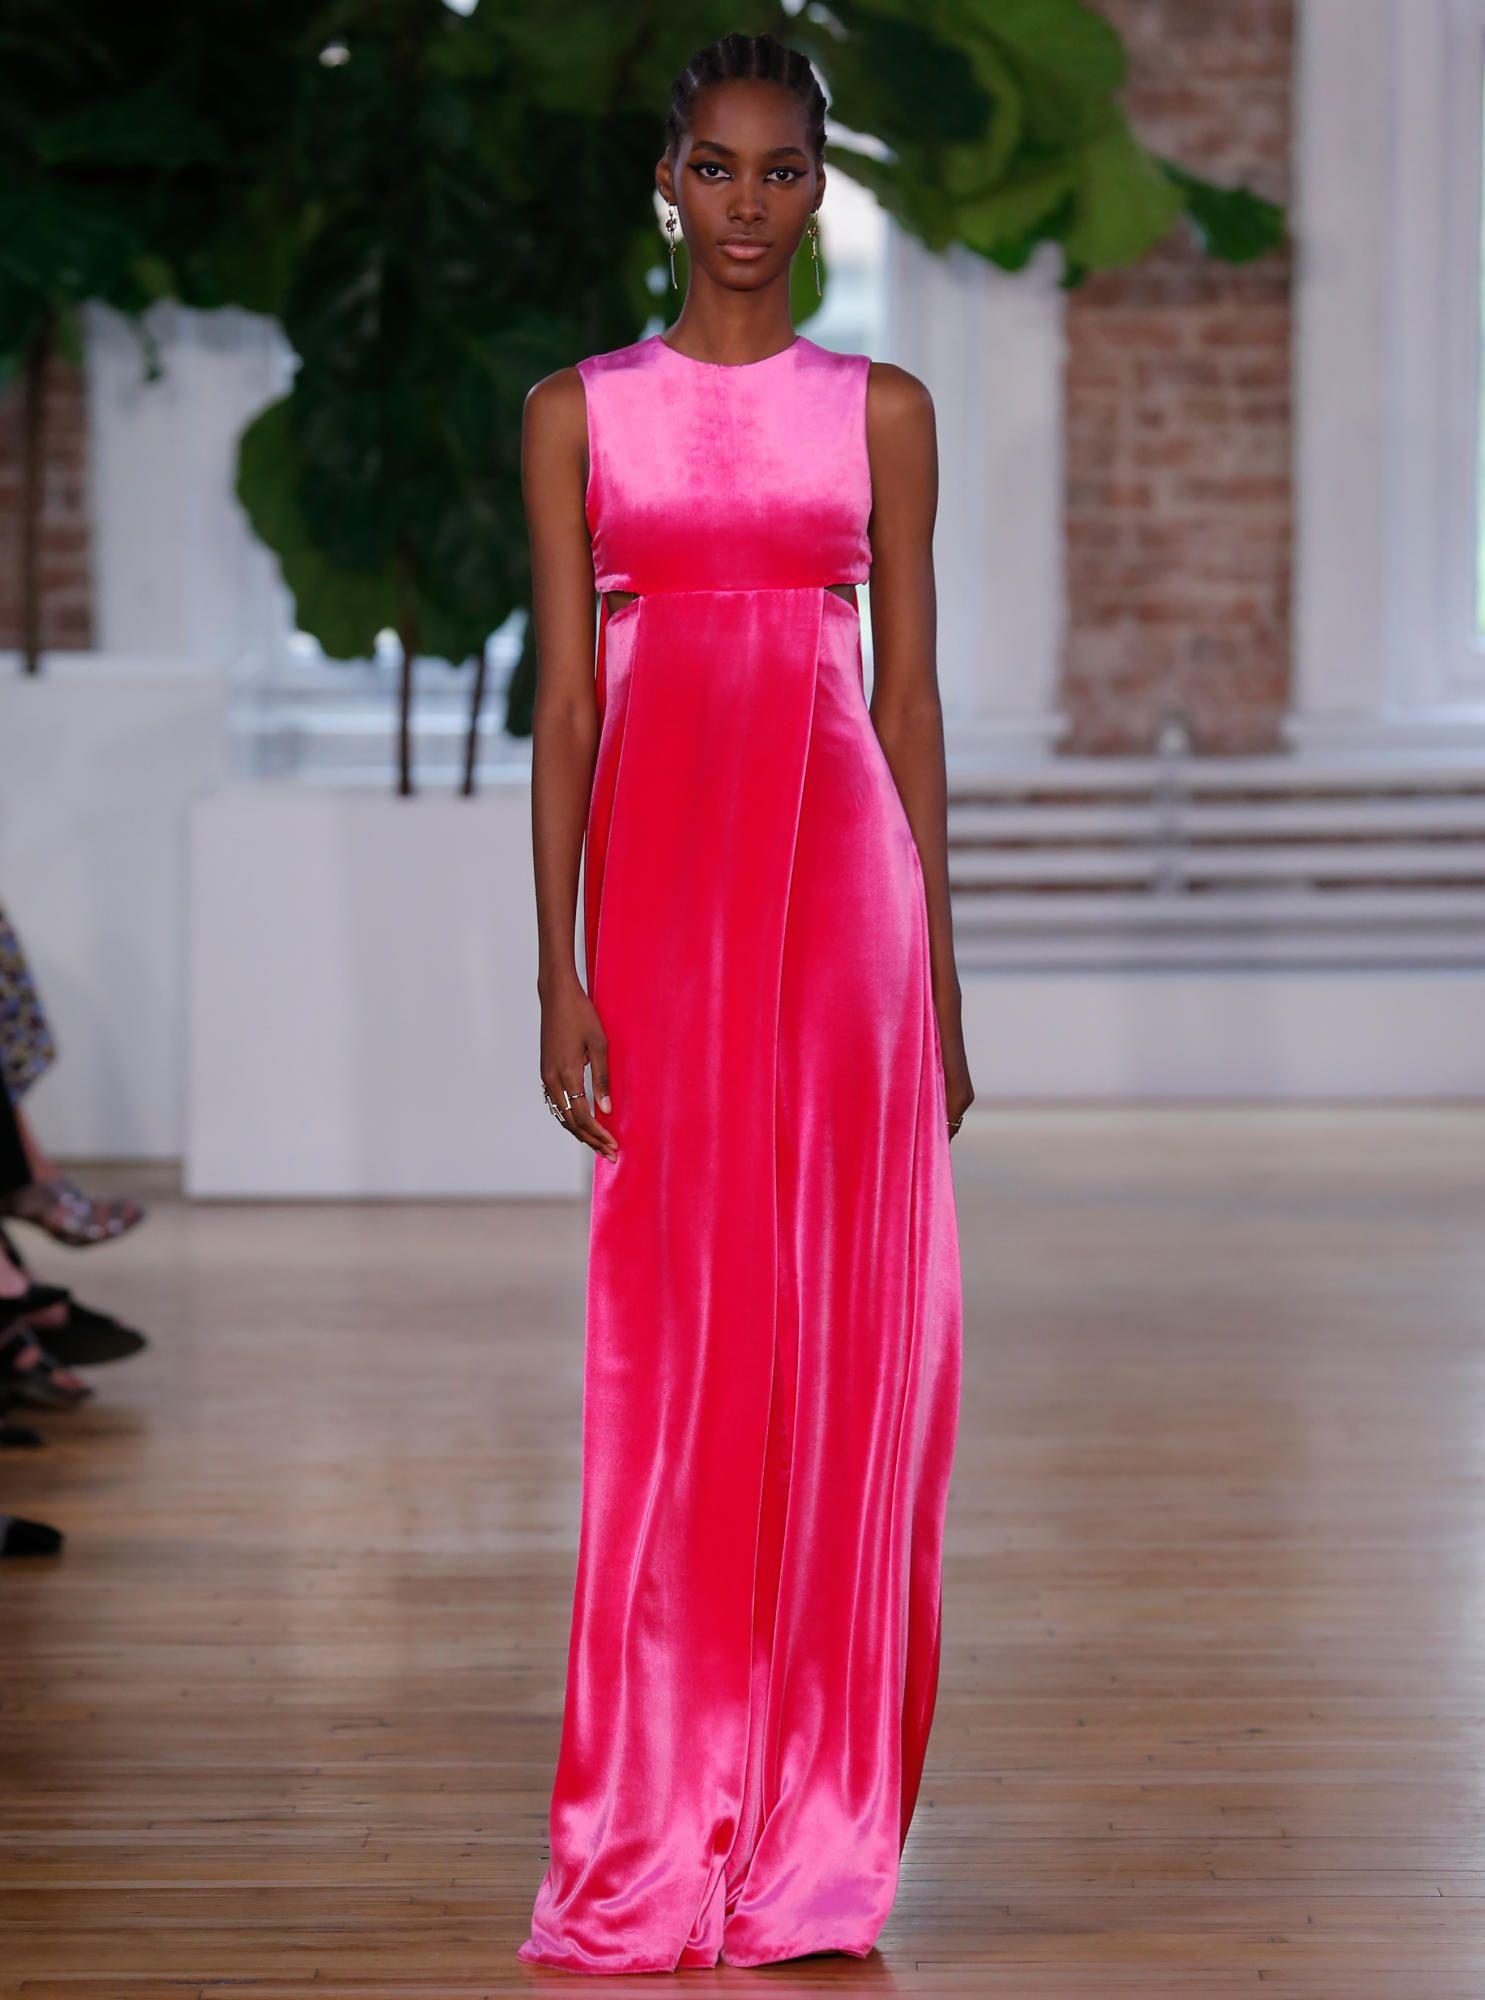 Nett Valentino Prom Kleid Ideen - Brautkleider Ideen - cashingy.info